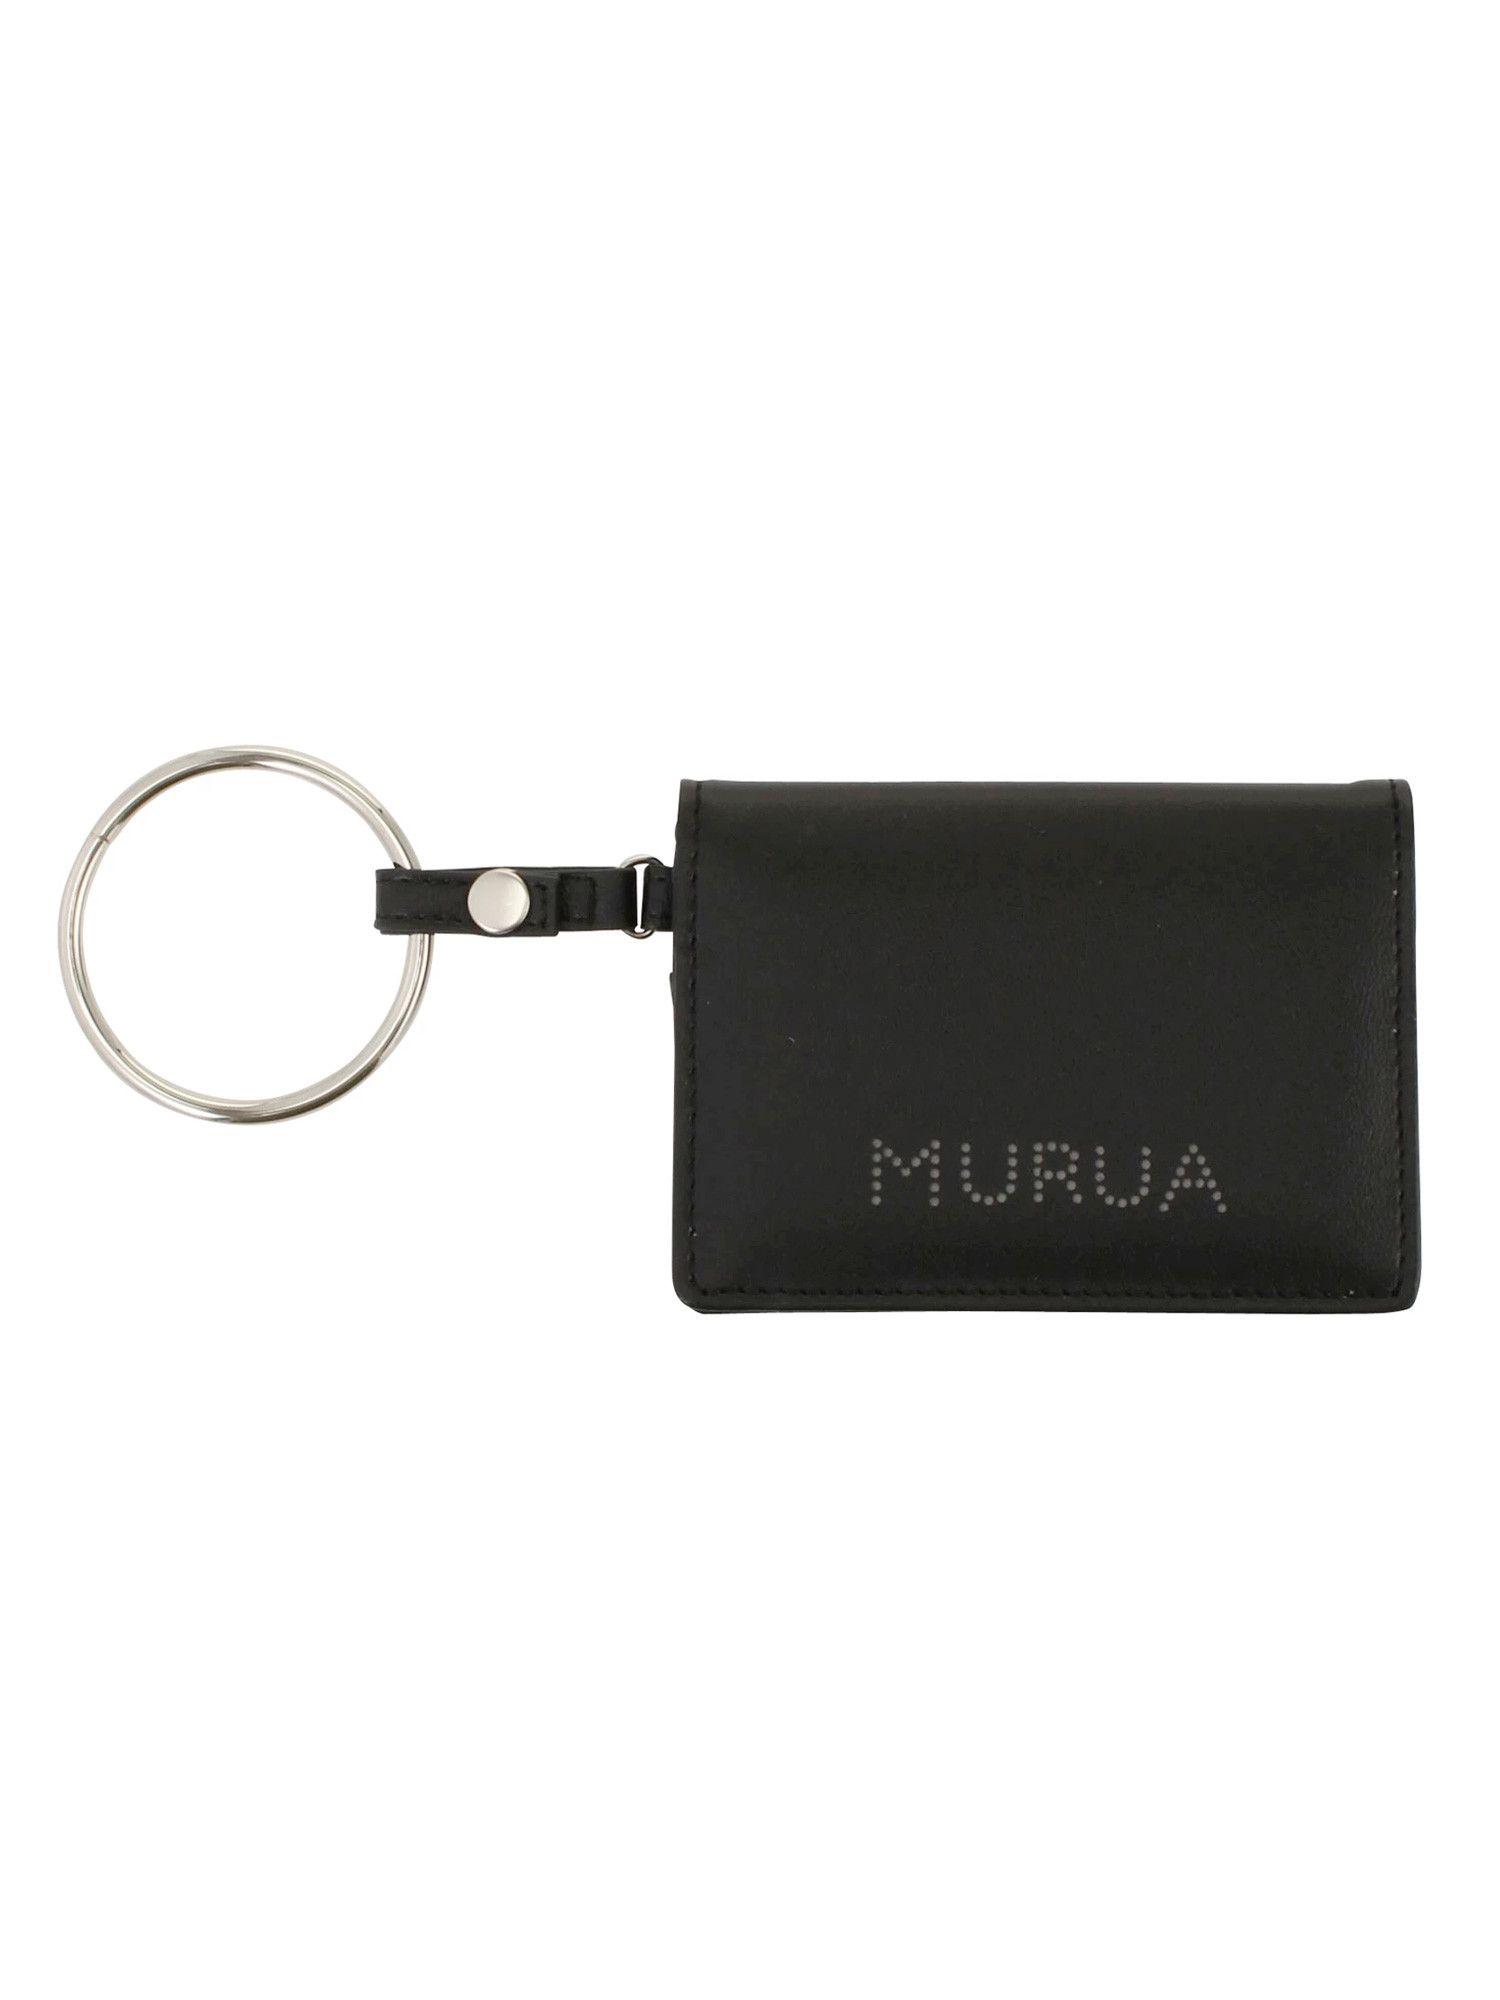 [MURUA] Pass Case